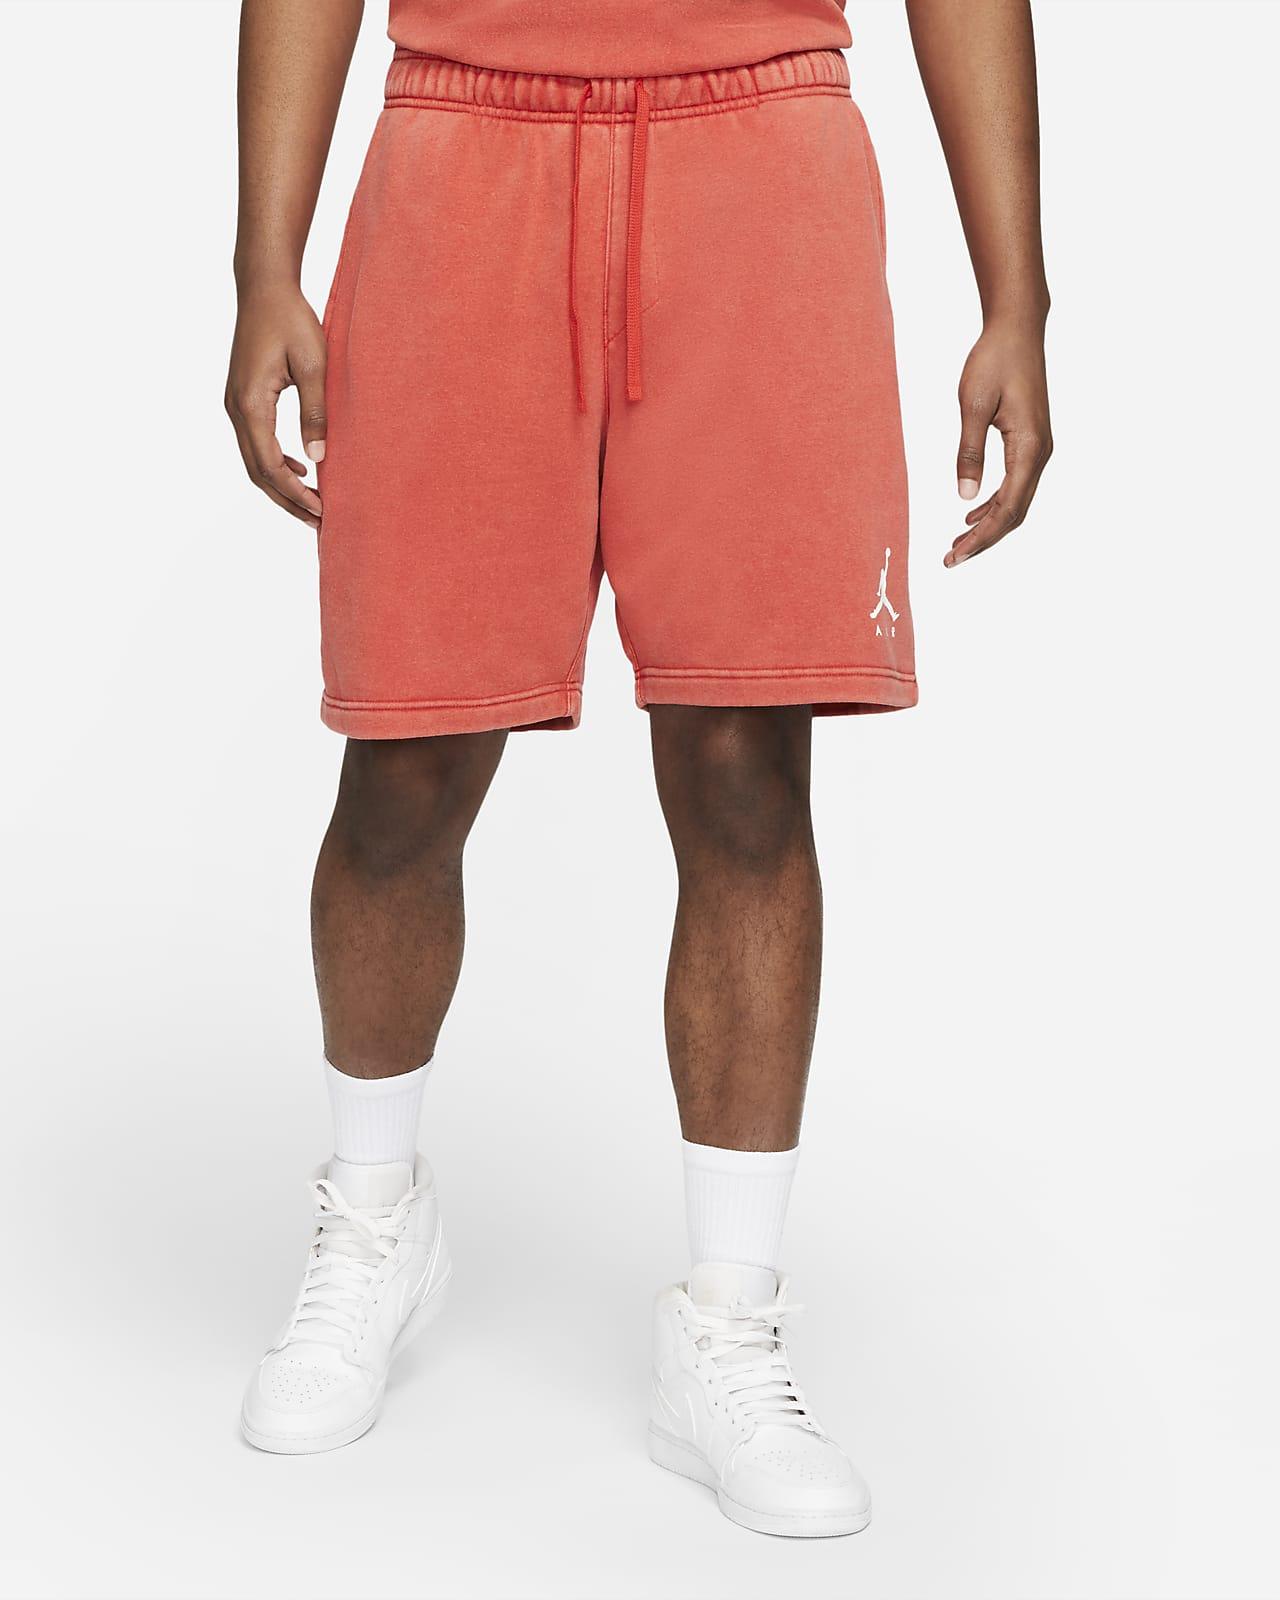 Shorts de tejido Fleece desgastados para hombre Jordan Jumpman